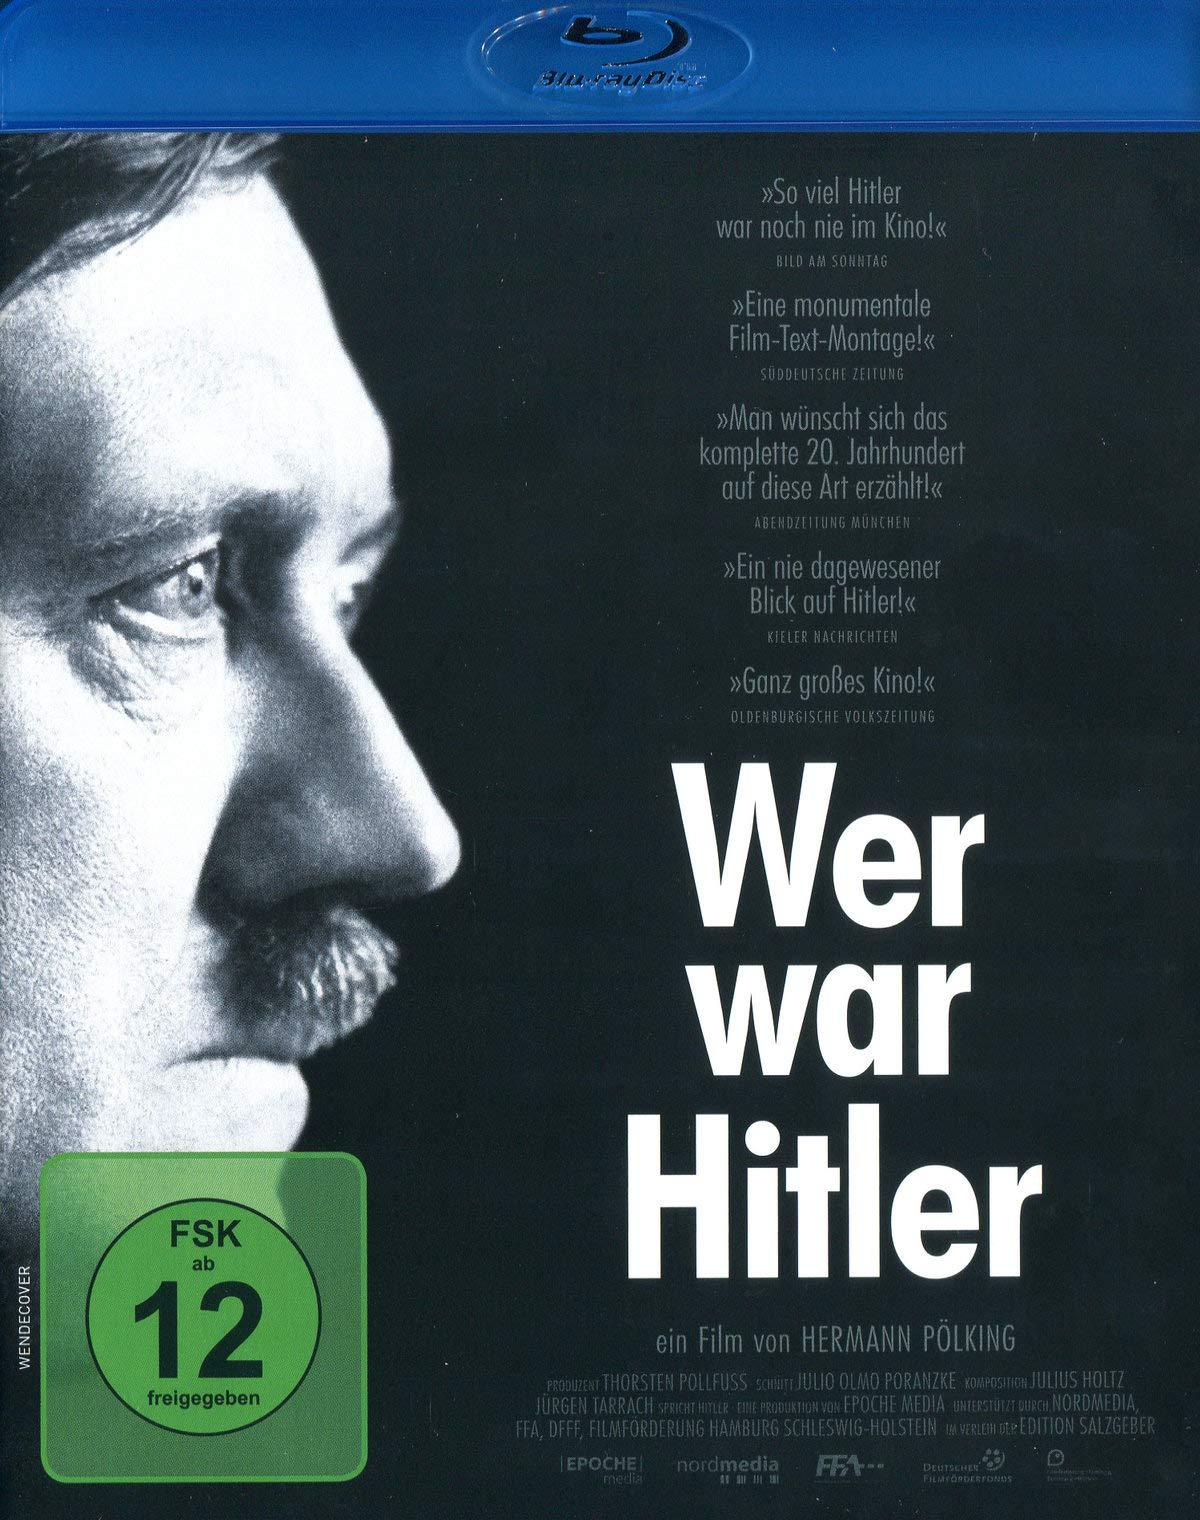 Wer.war.Hitler.2017.GERMAN.DOKU.1080p.BluRay.AVC-iTSMEMARiO